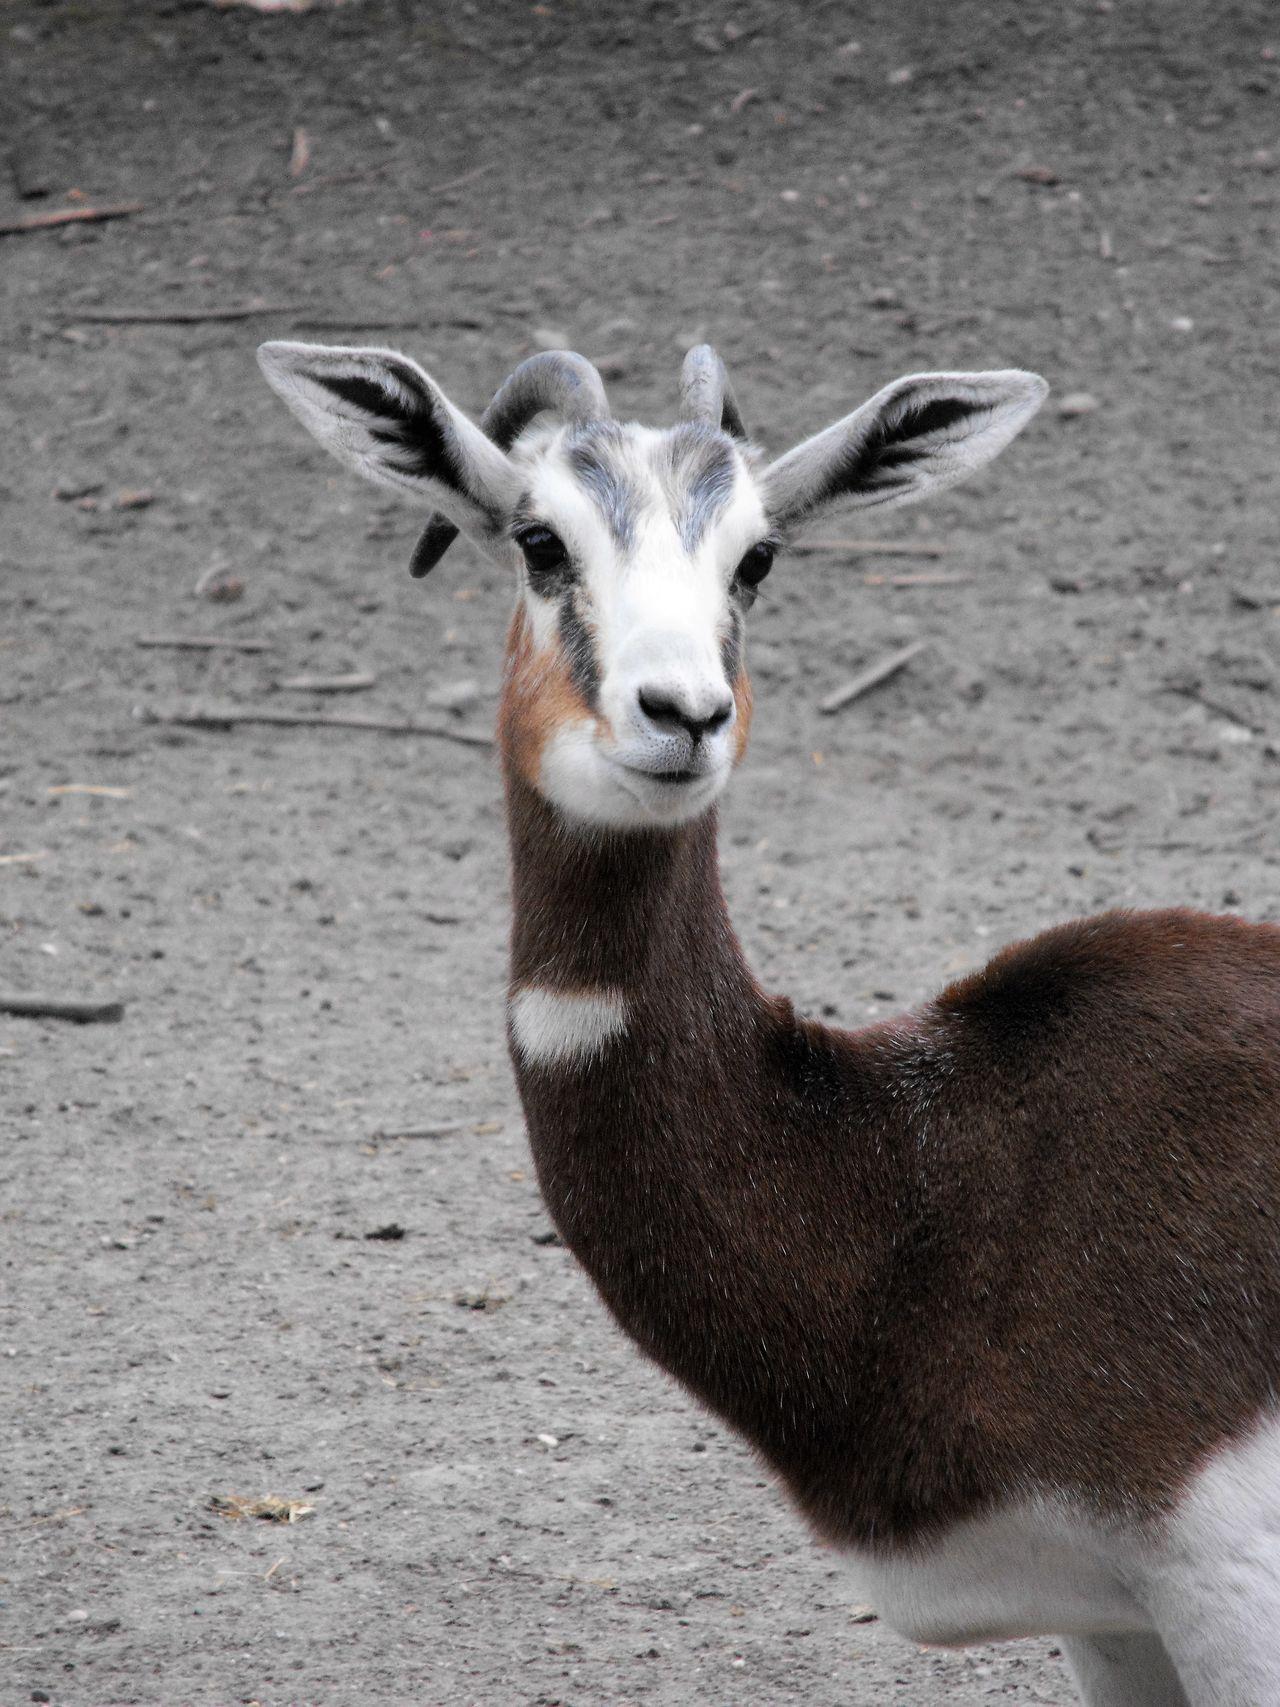 Animal Themes Antilope Big Ears Brown Focus On Foreground Gazelle Looking Away Mammal No People One Animal Outdoors Portrait Savannah Ungulates Vertebrate Wildlife Zoo Zoology